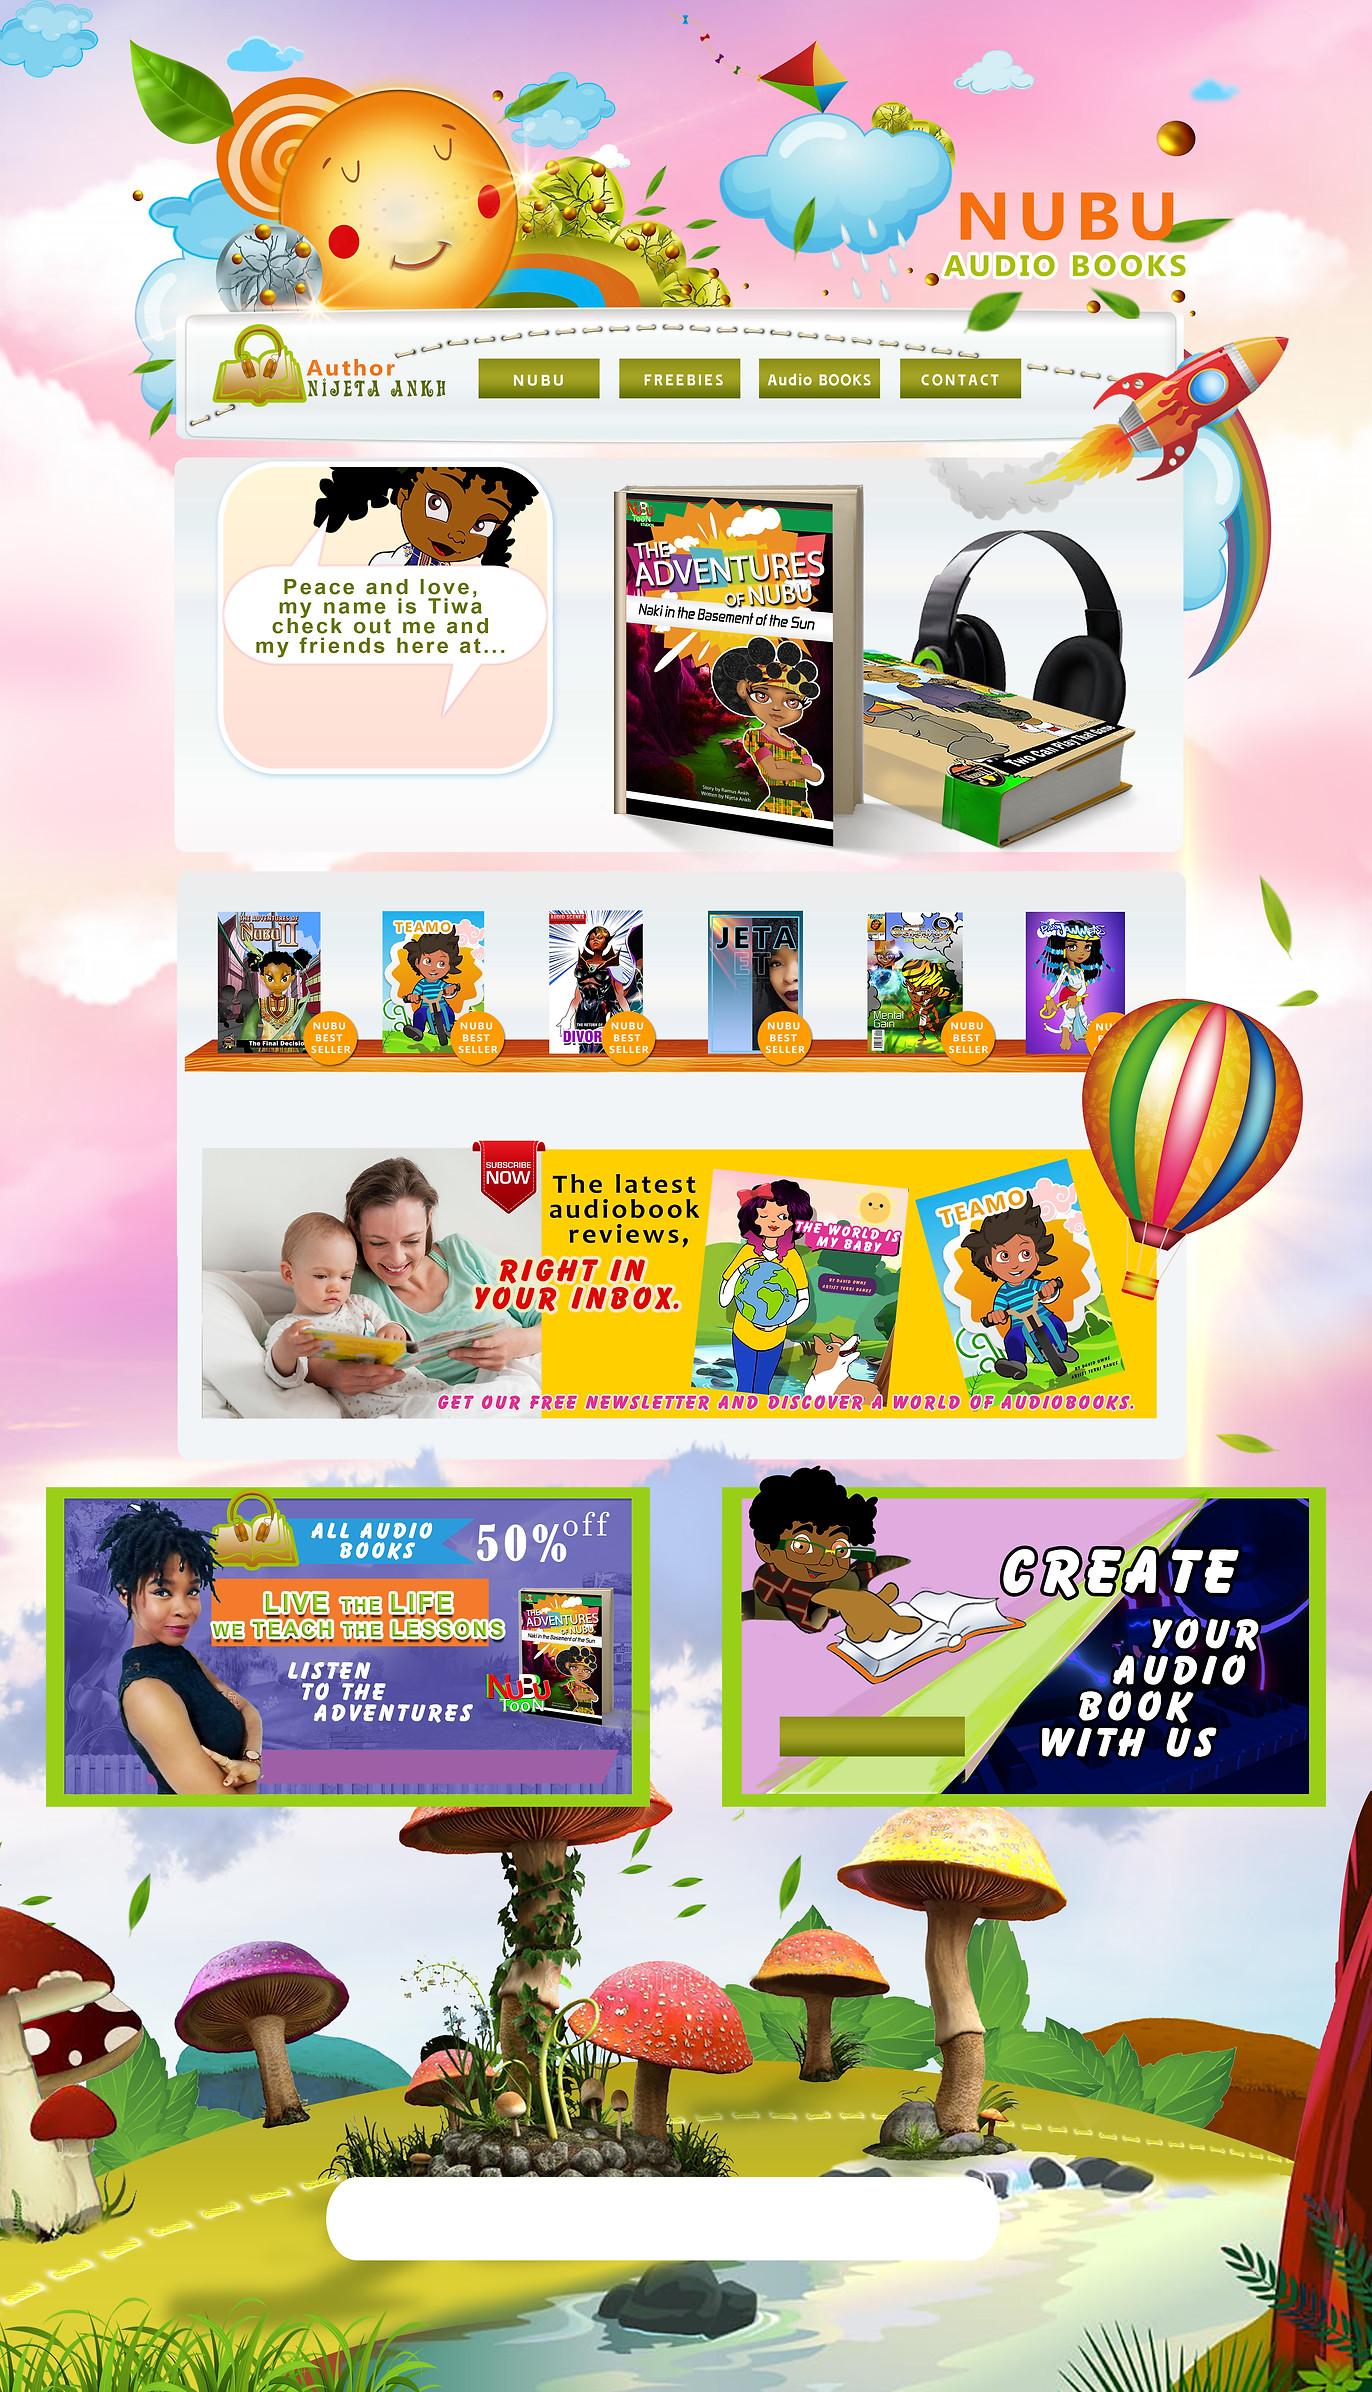 NUBU AUDIO BOOKS homepage.jpg